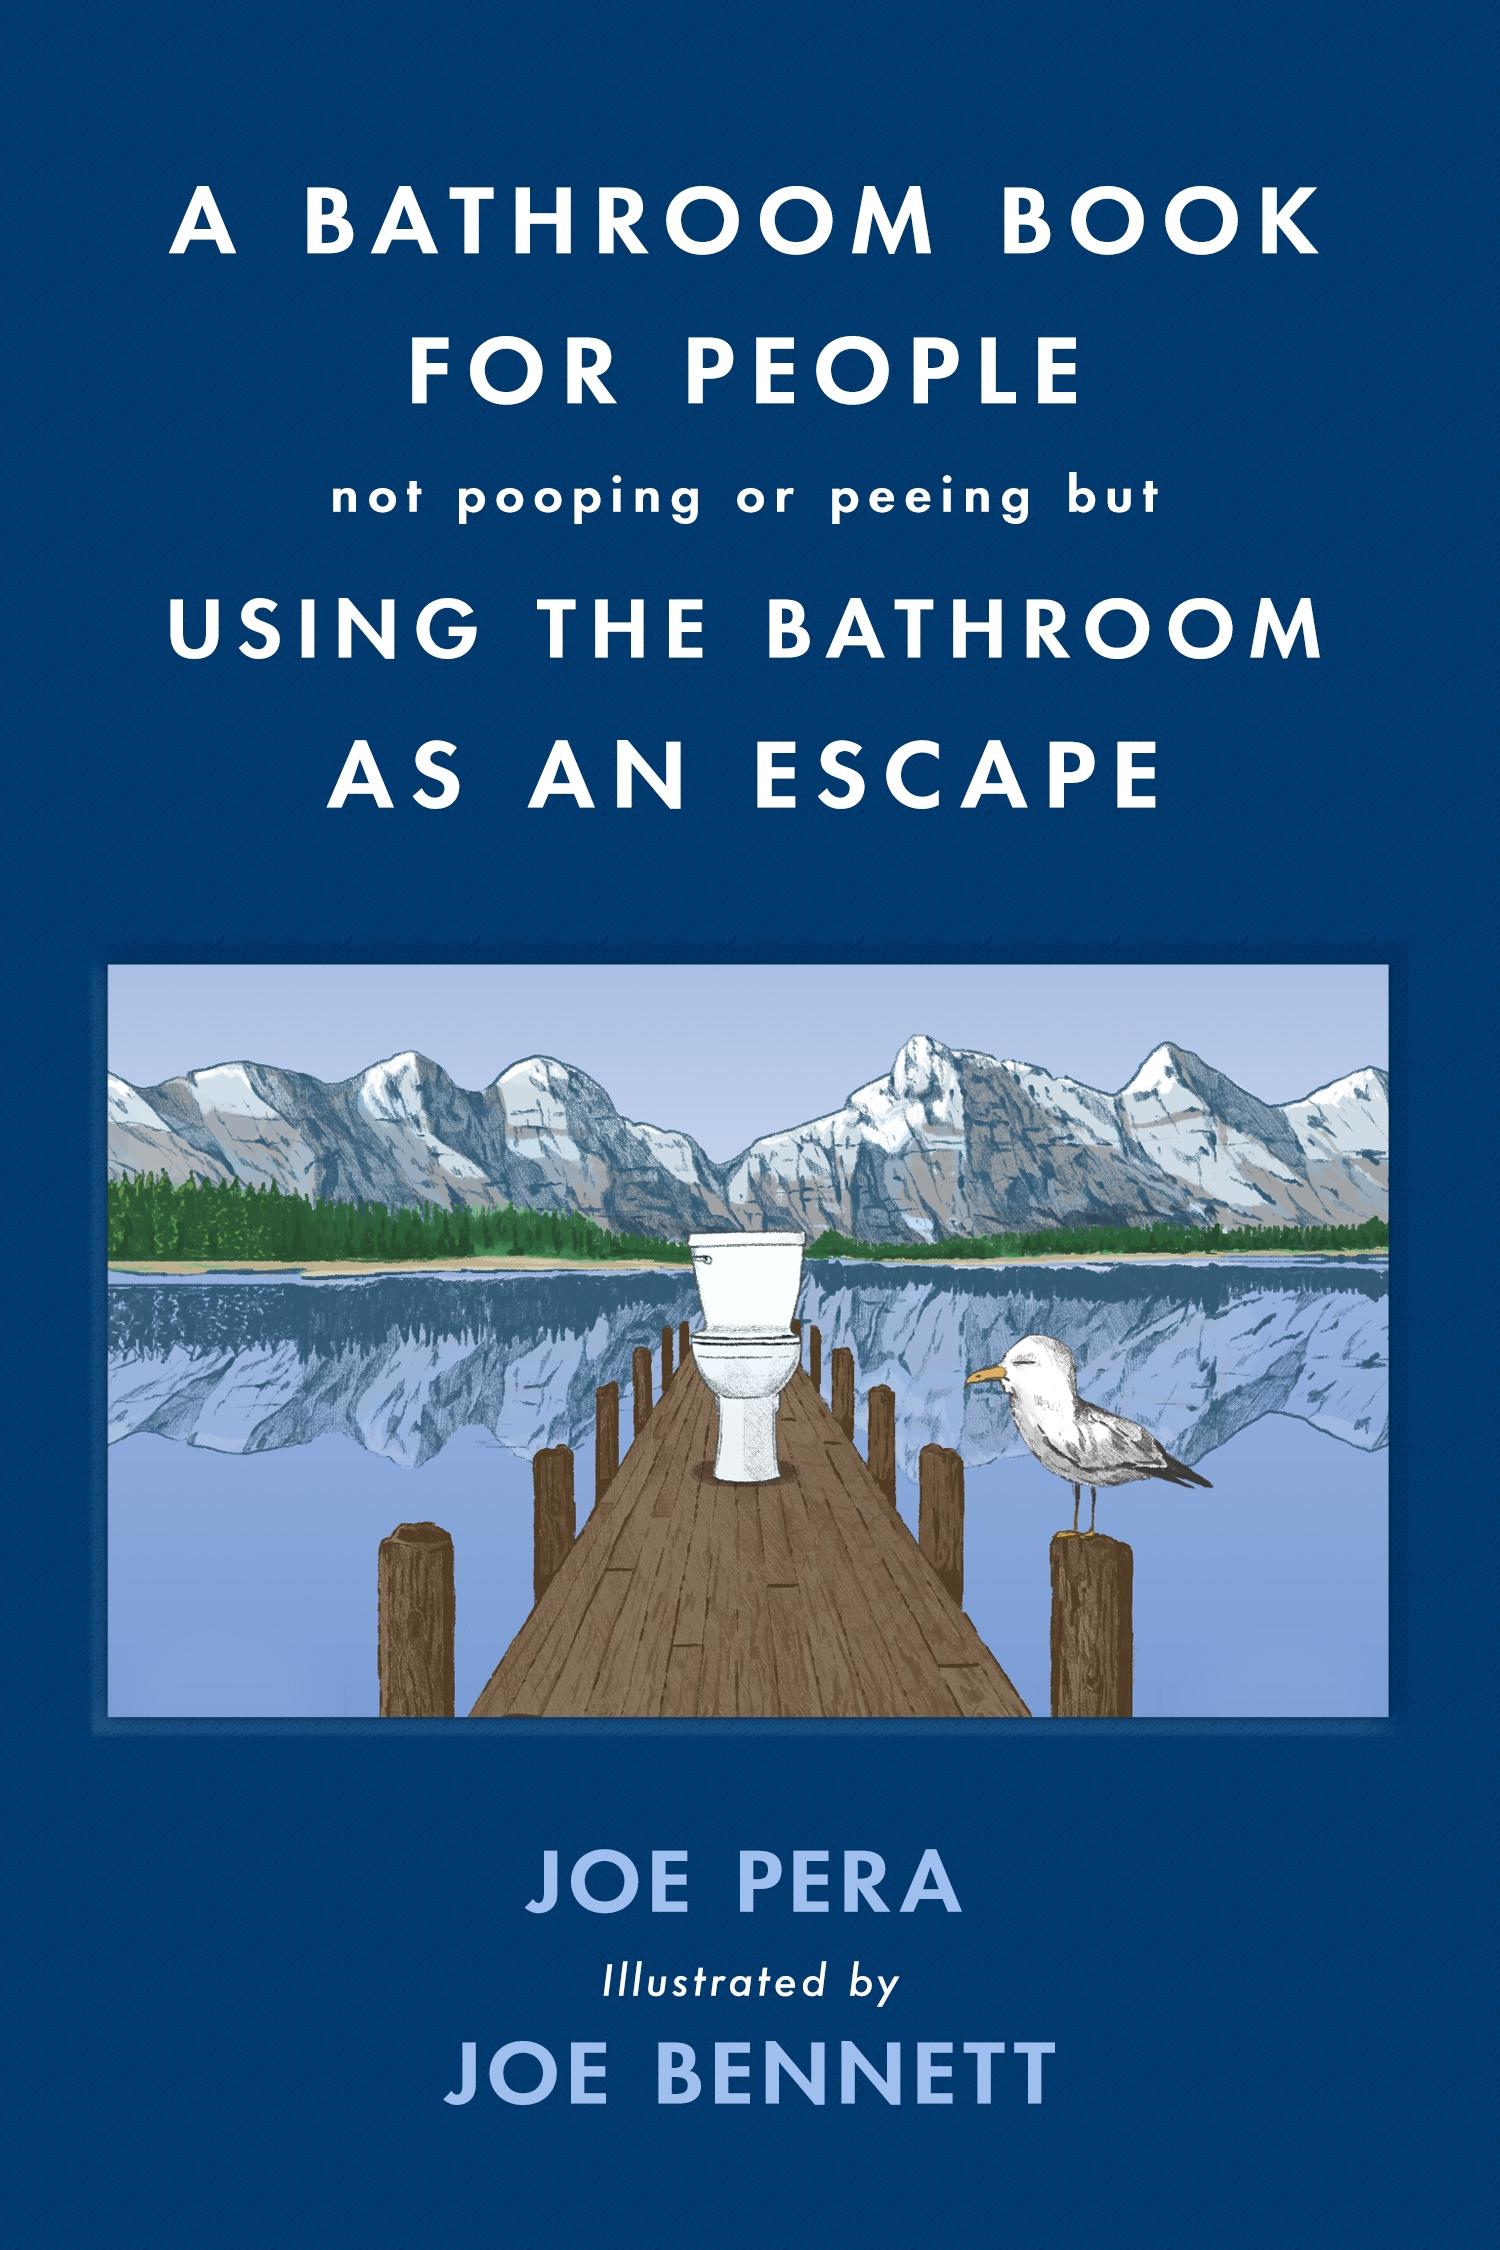 Bathroom Book by Joe Pera and Joe Bennett